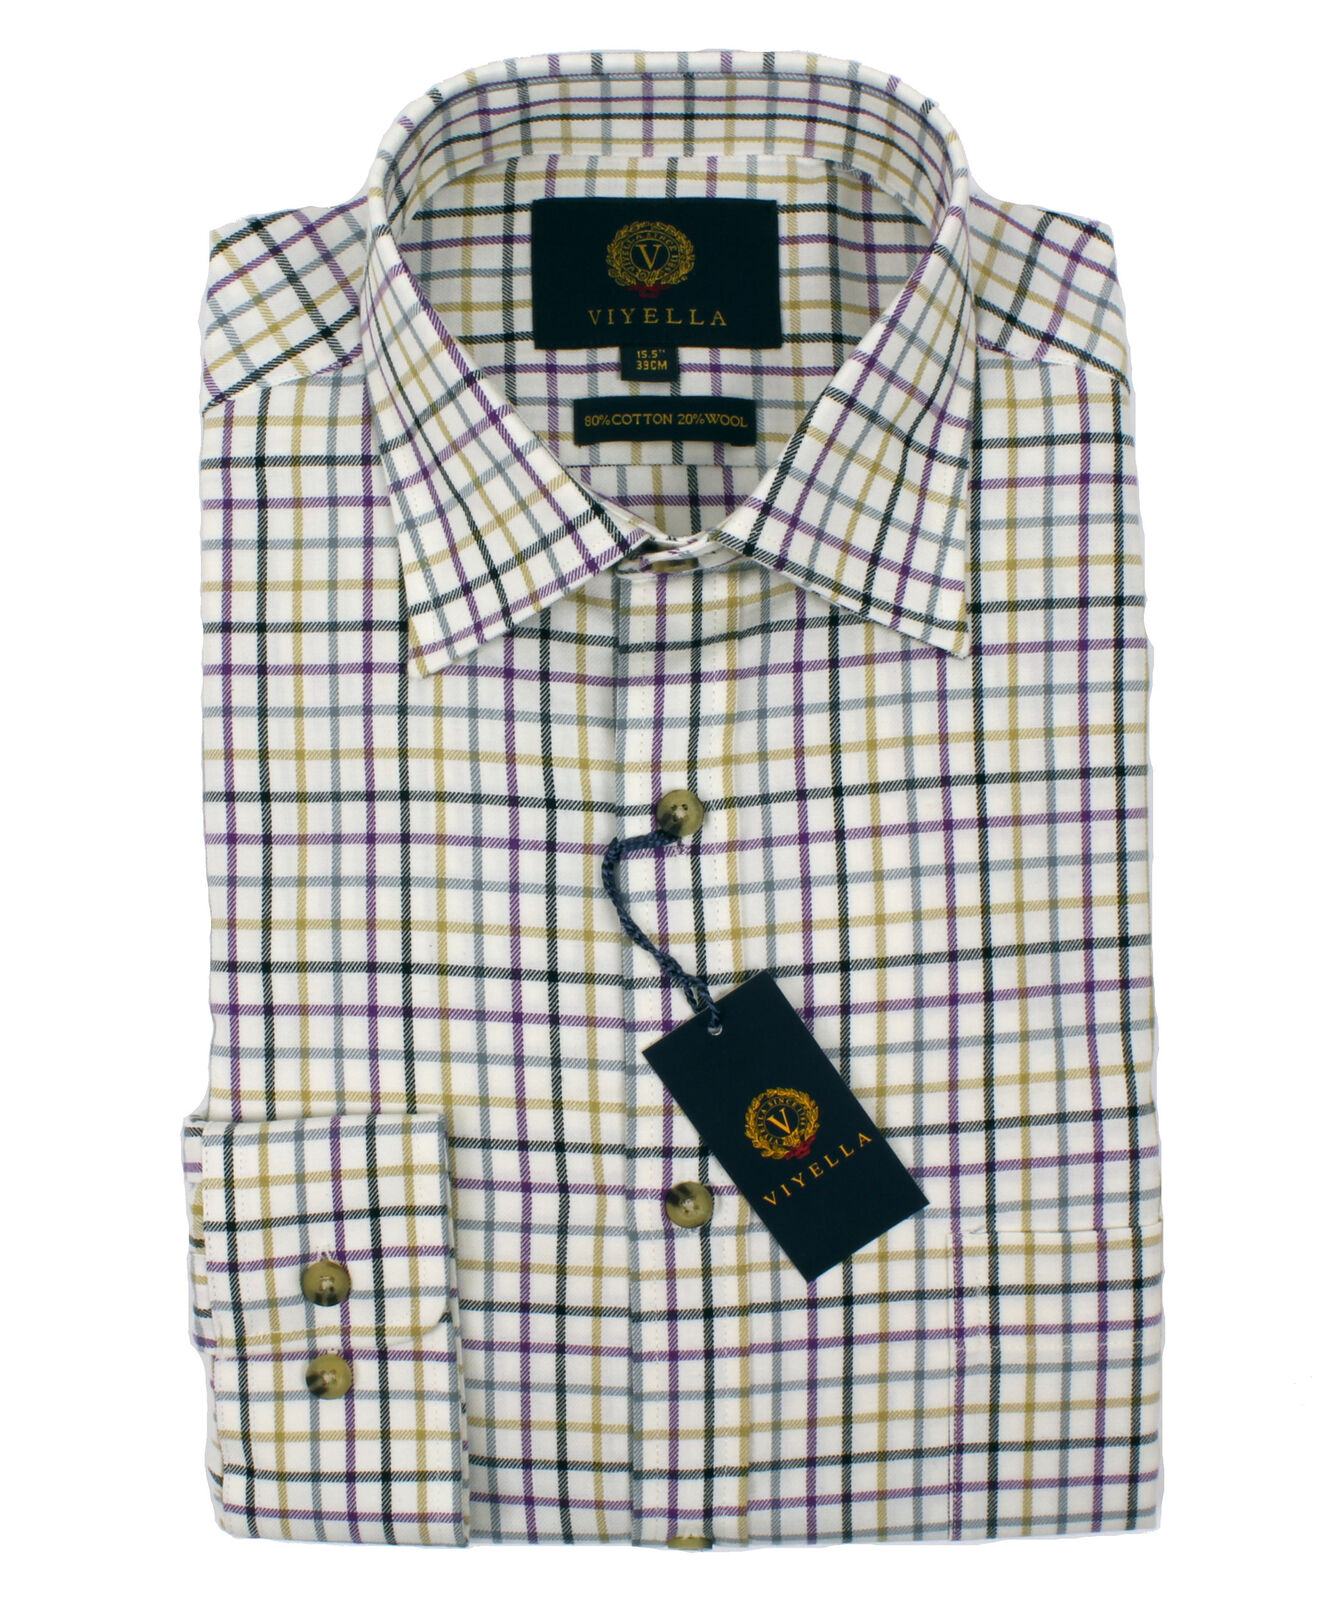 Viyella Tattersall 80 20 Cotton Wool Blend Shirt in Heather